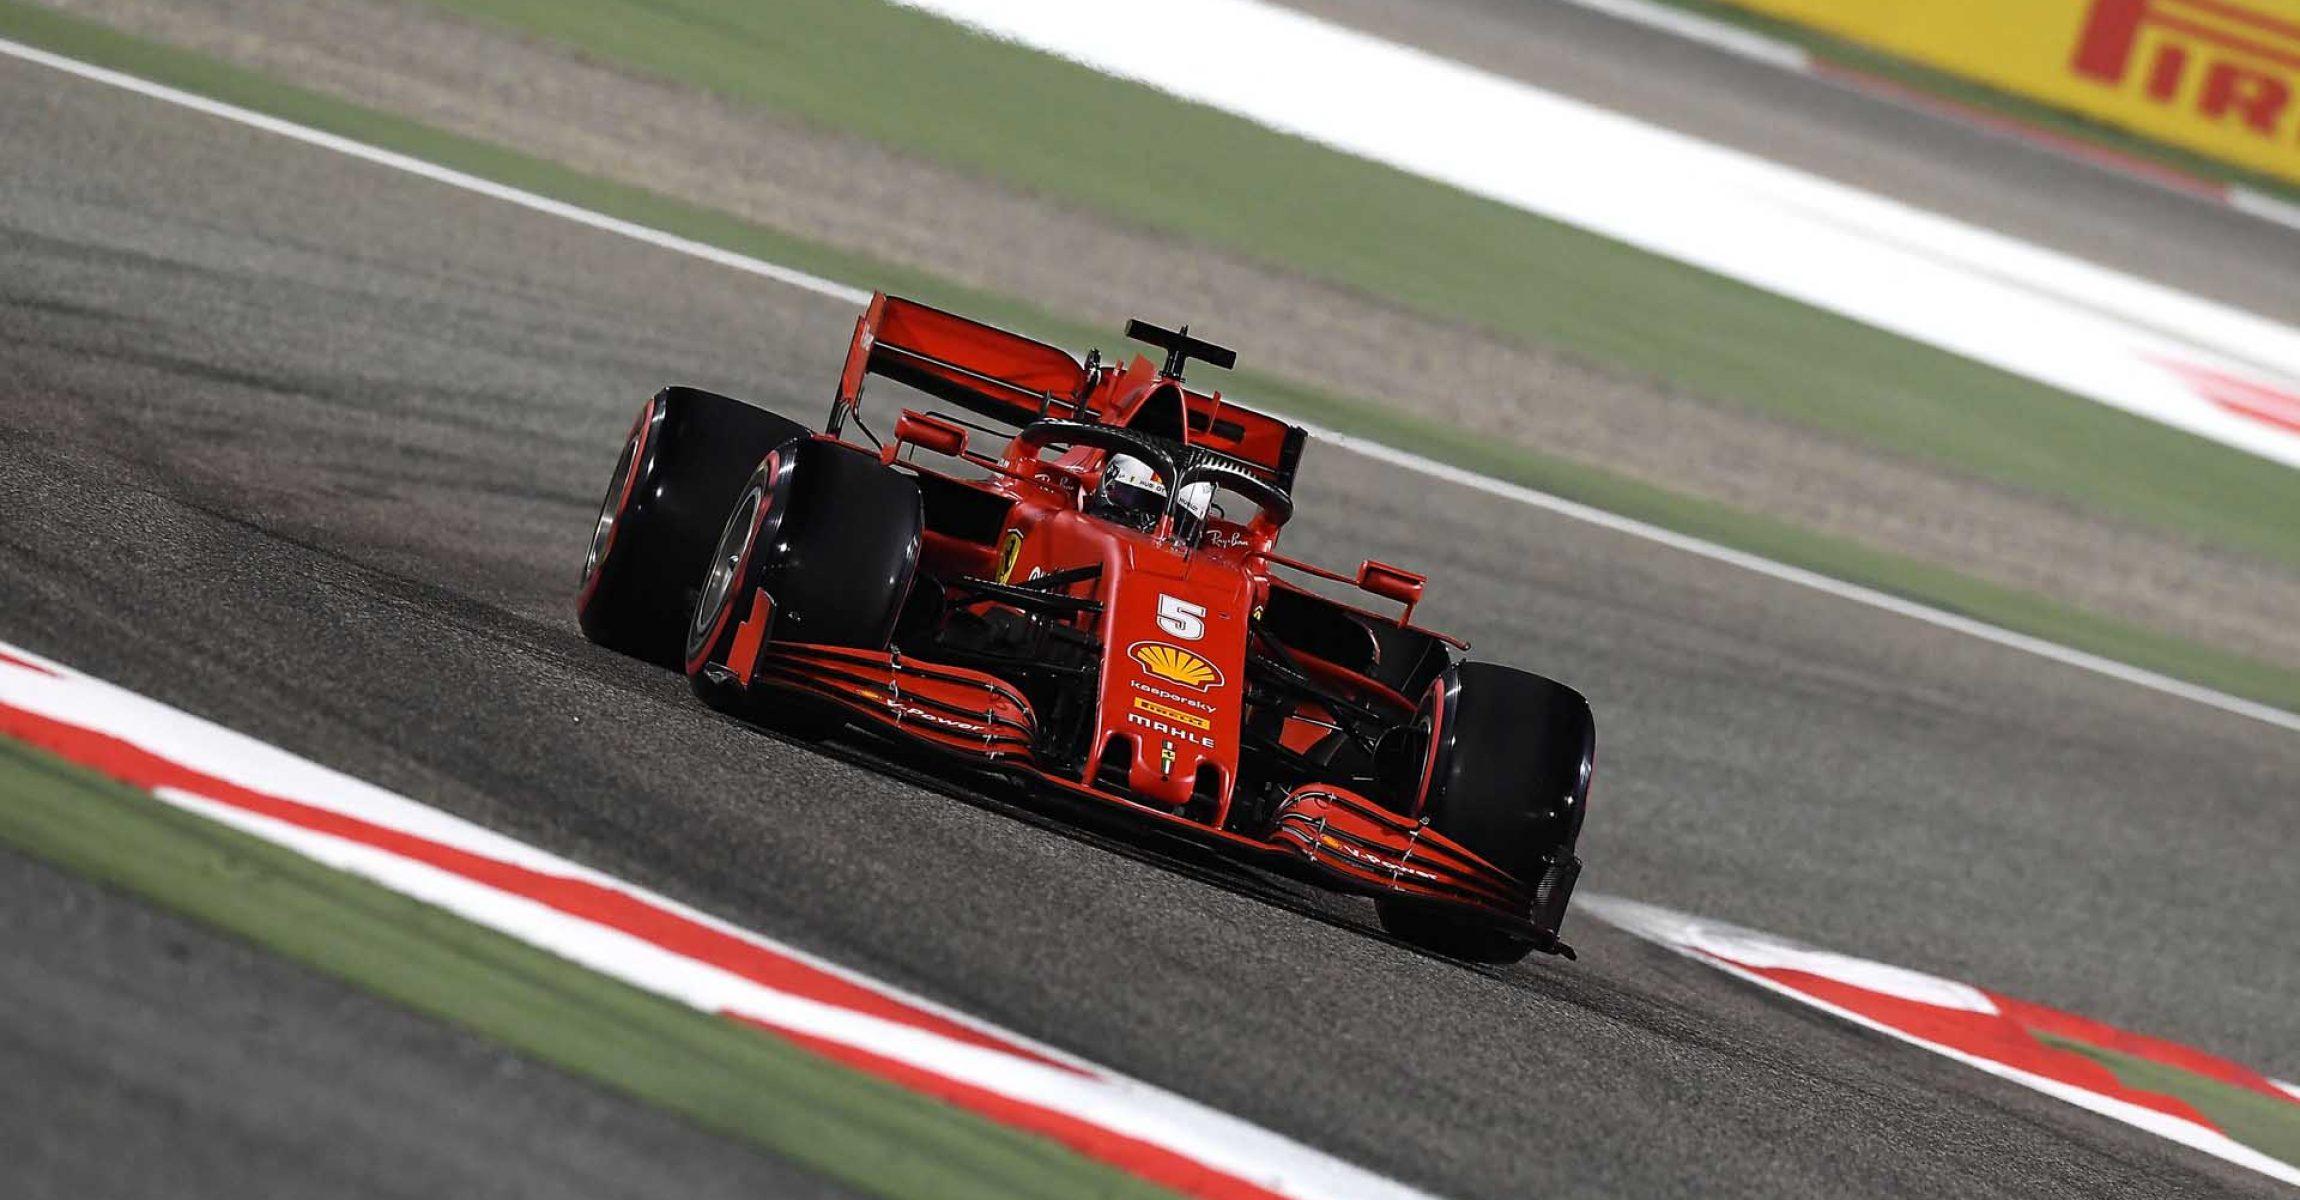 GP BAHRAIN  F1/2020 - SABATO 28/11/2020   credit: @Scuderia Ferrari Press Office Sebastian Vettel